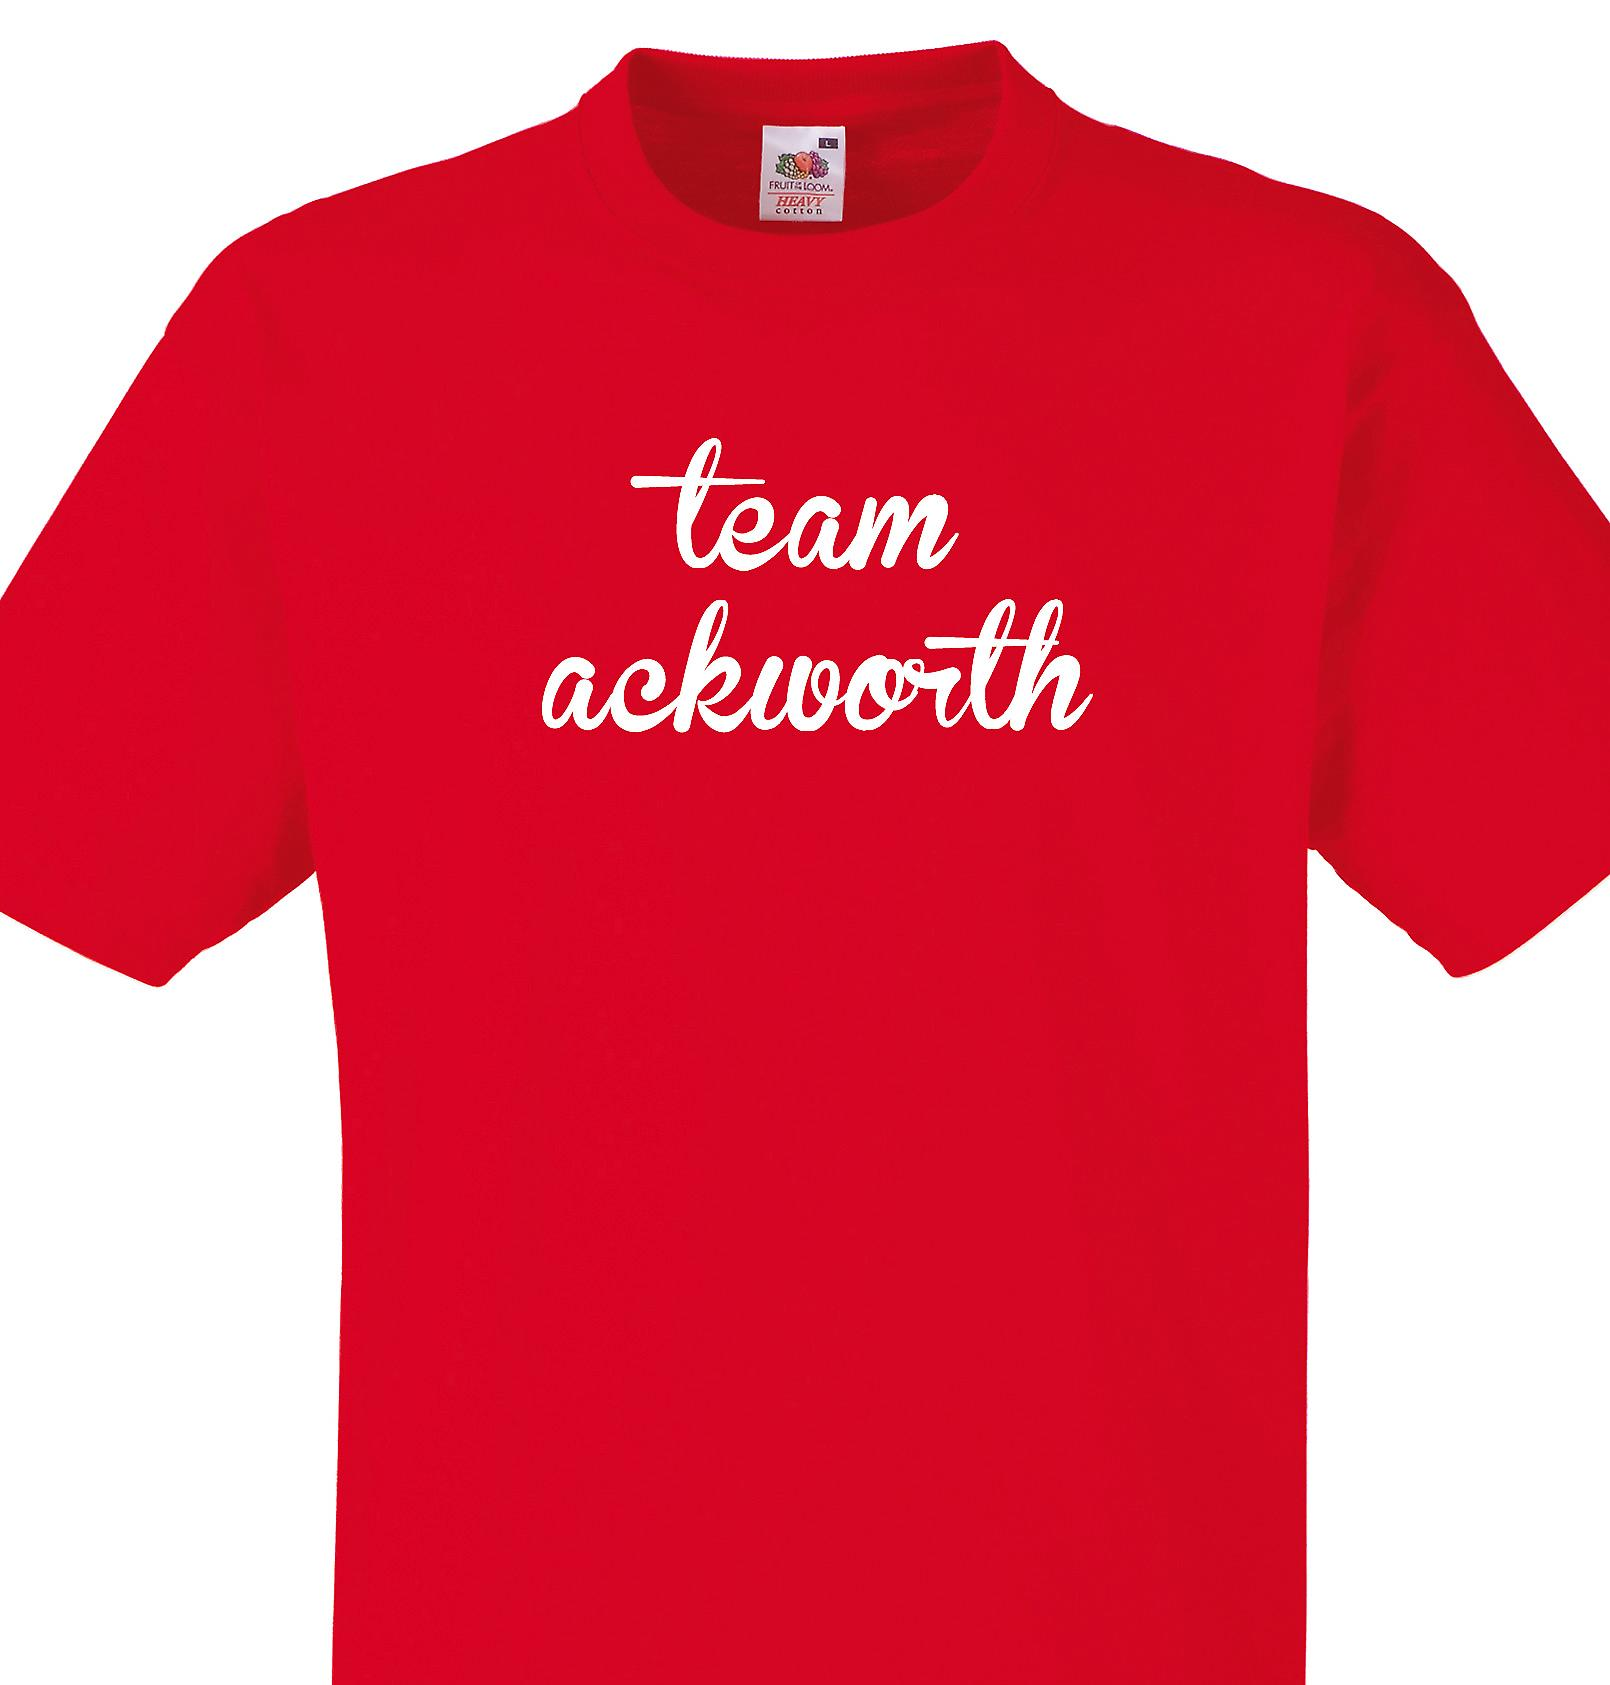 Team Ackworth Red T shirt